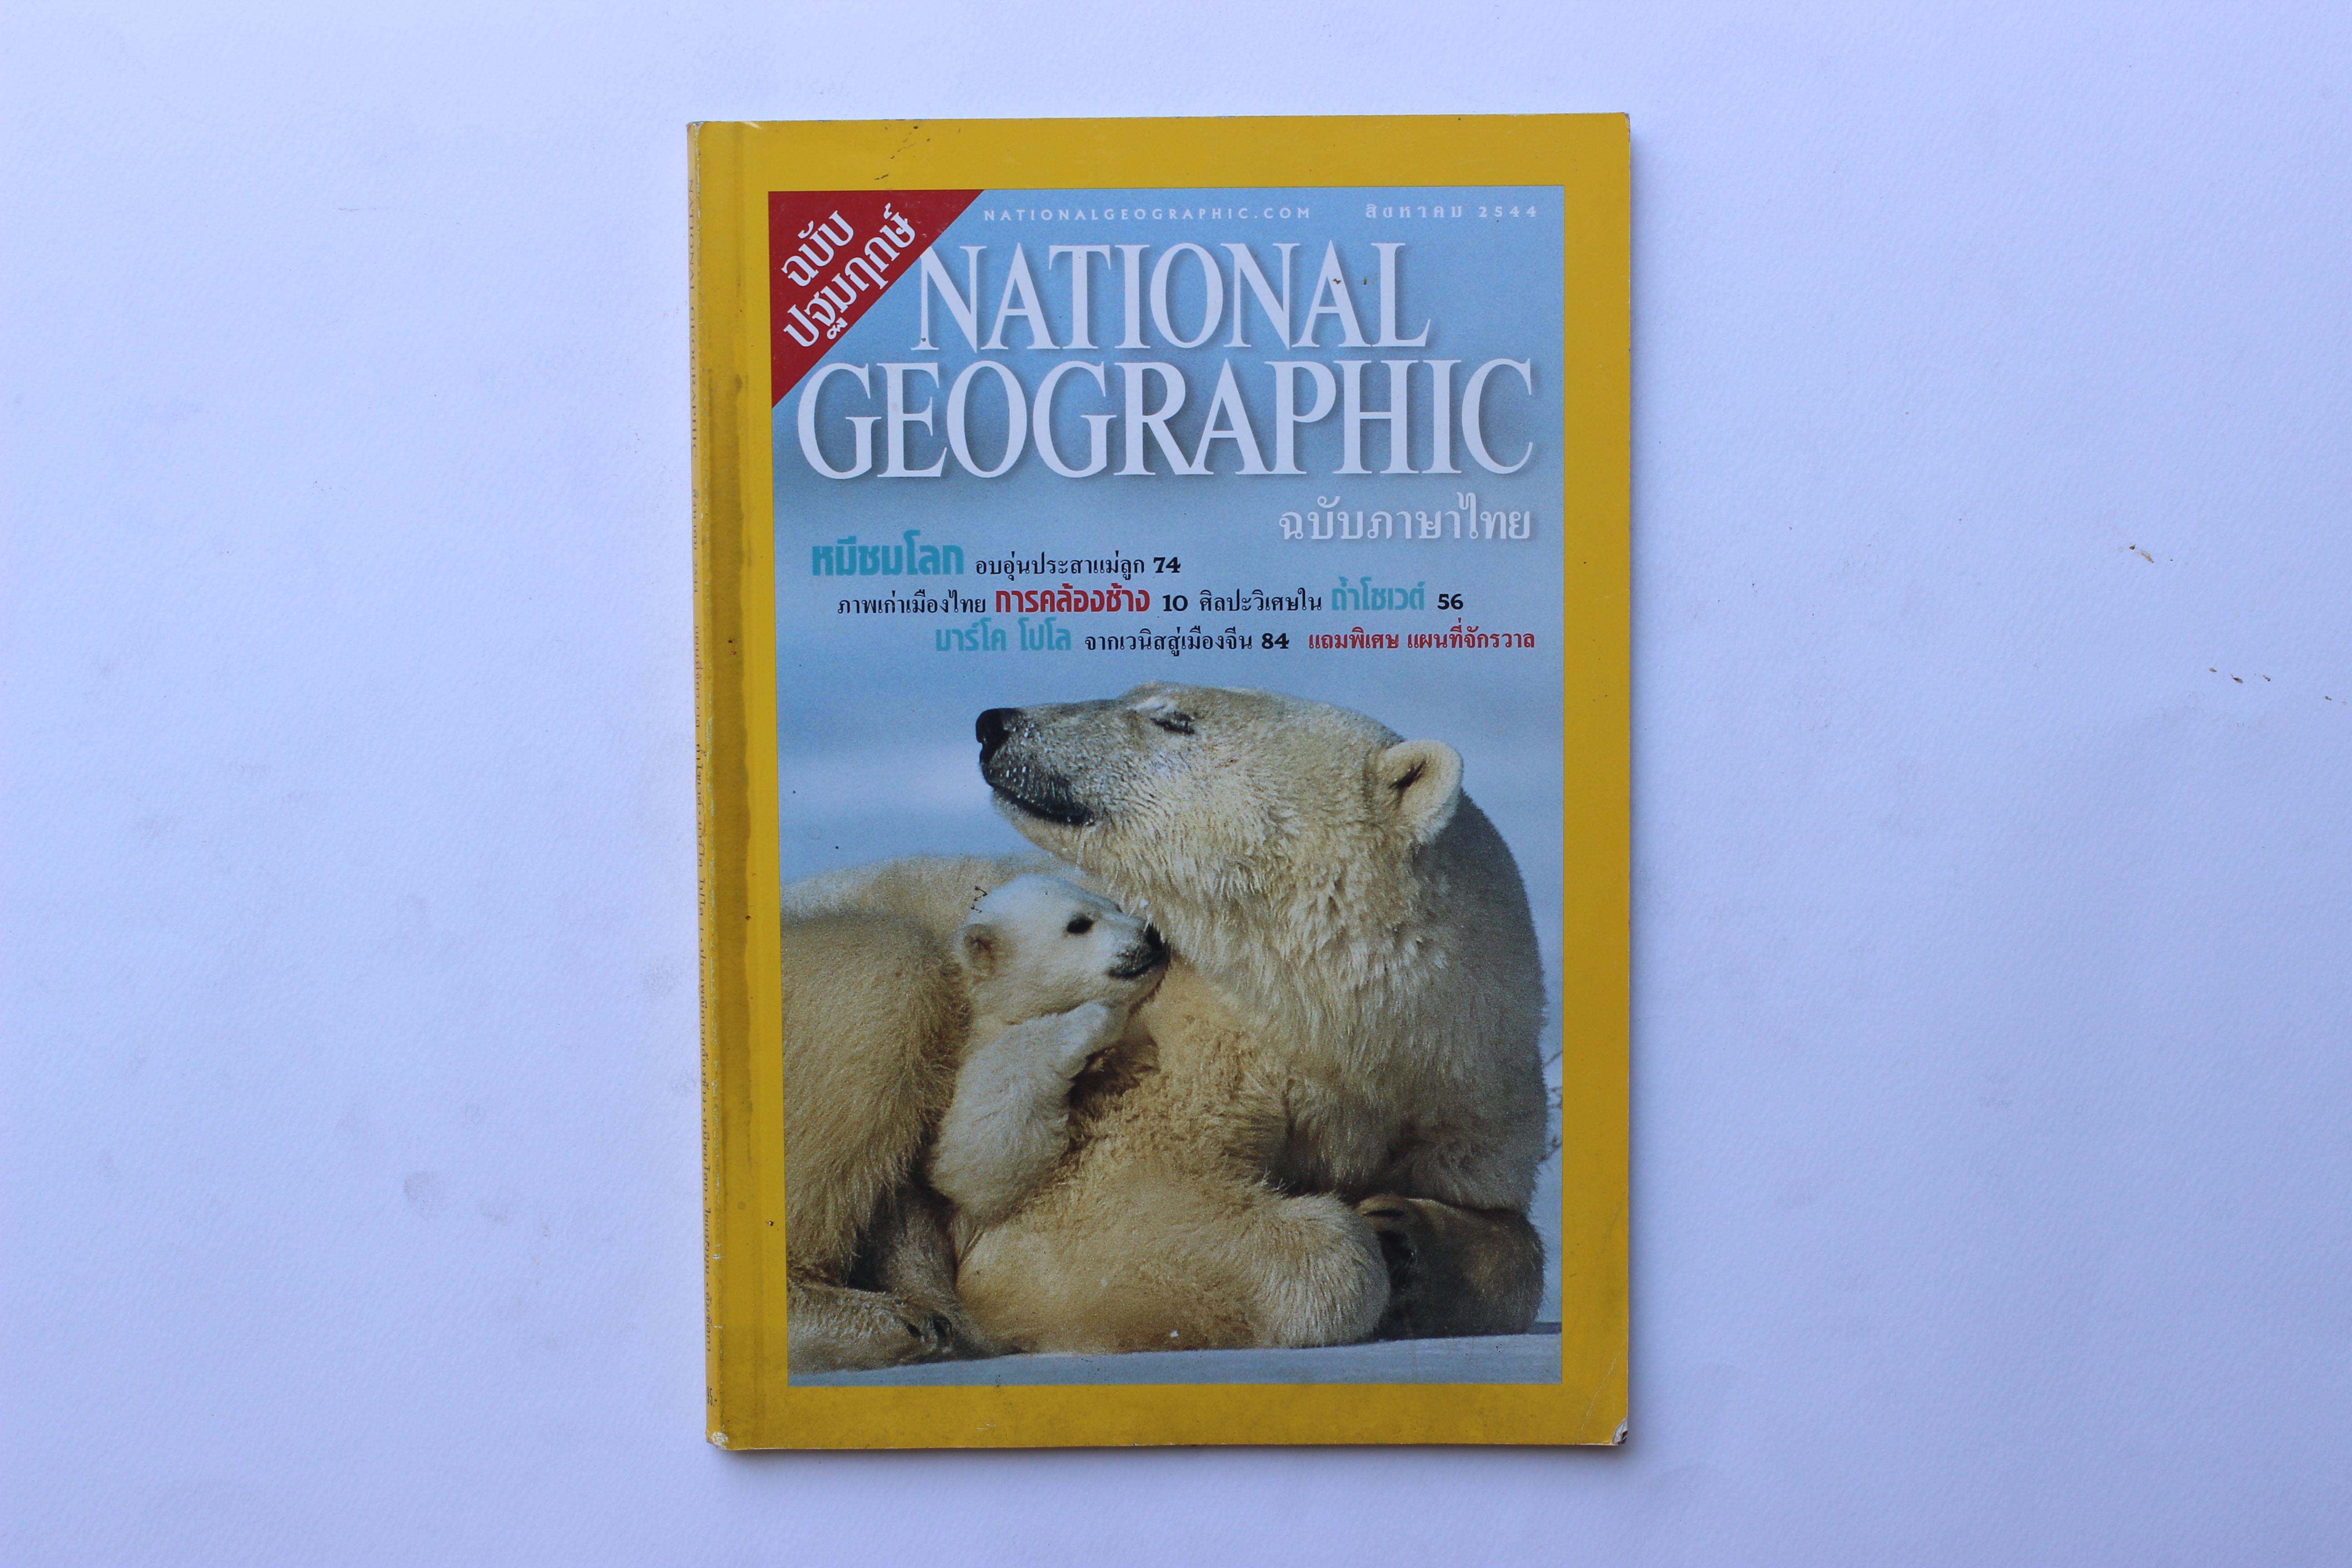 NATIONAL GEOGRAPHIC ฉบับภาษาไทย สิงหาคม 2544 ฉบับปฐมฤกษ์